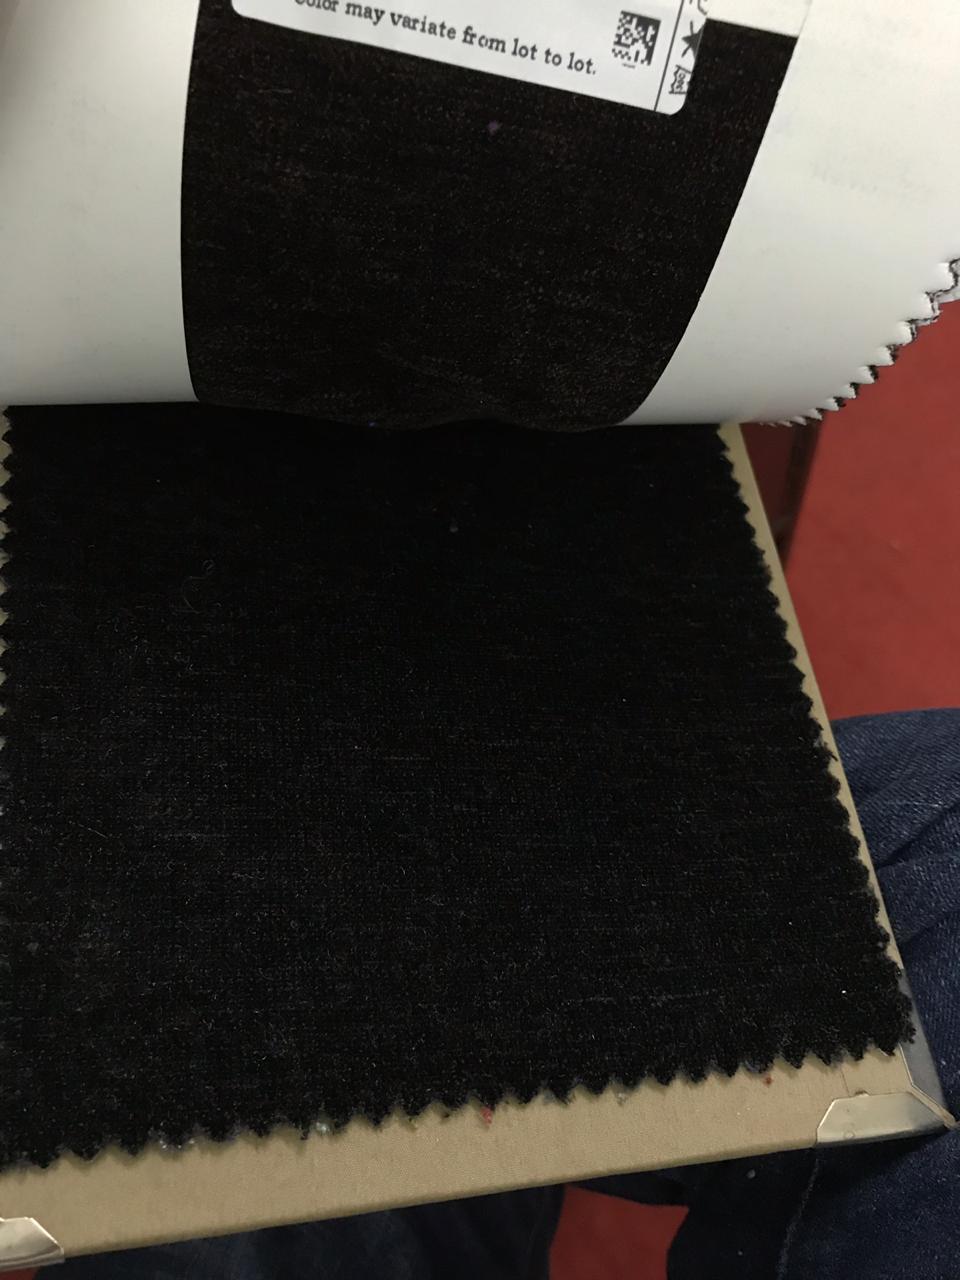 Molphino Sofa fabric